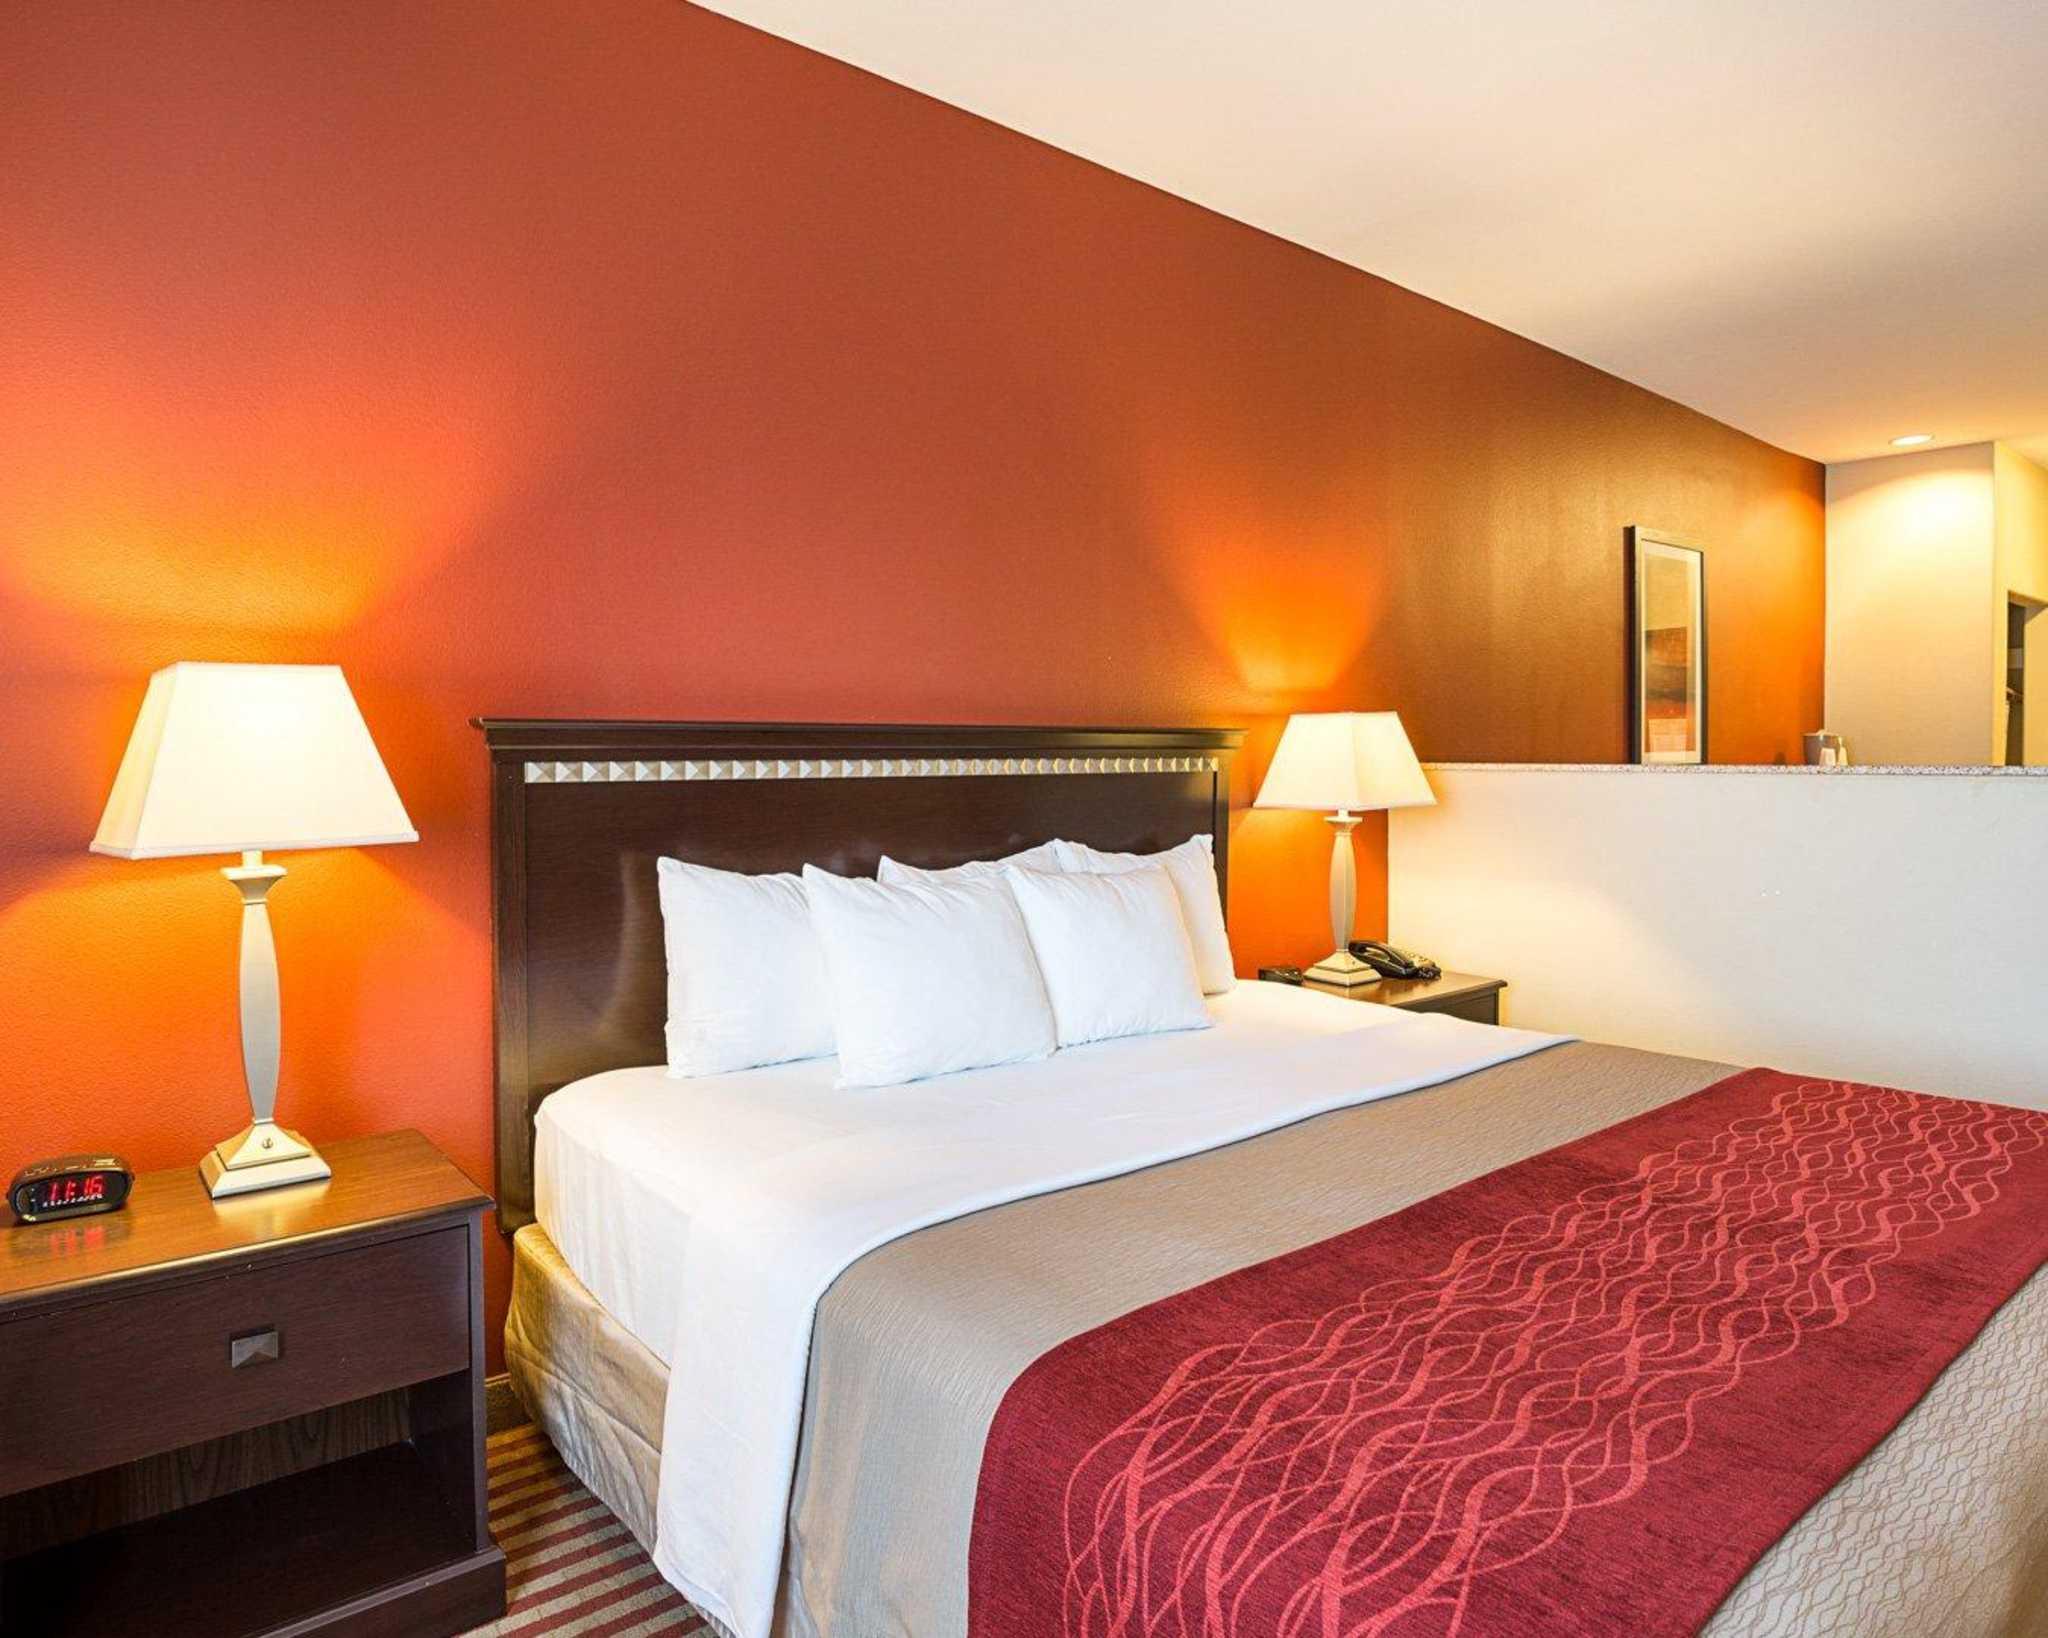 Rooms For Rent In Orange Tx